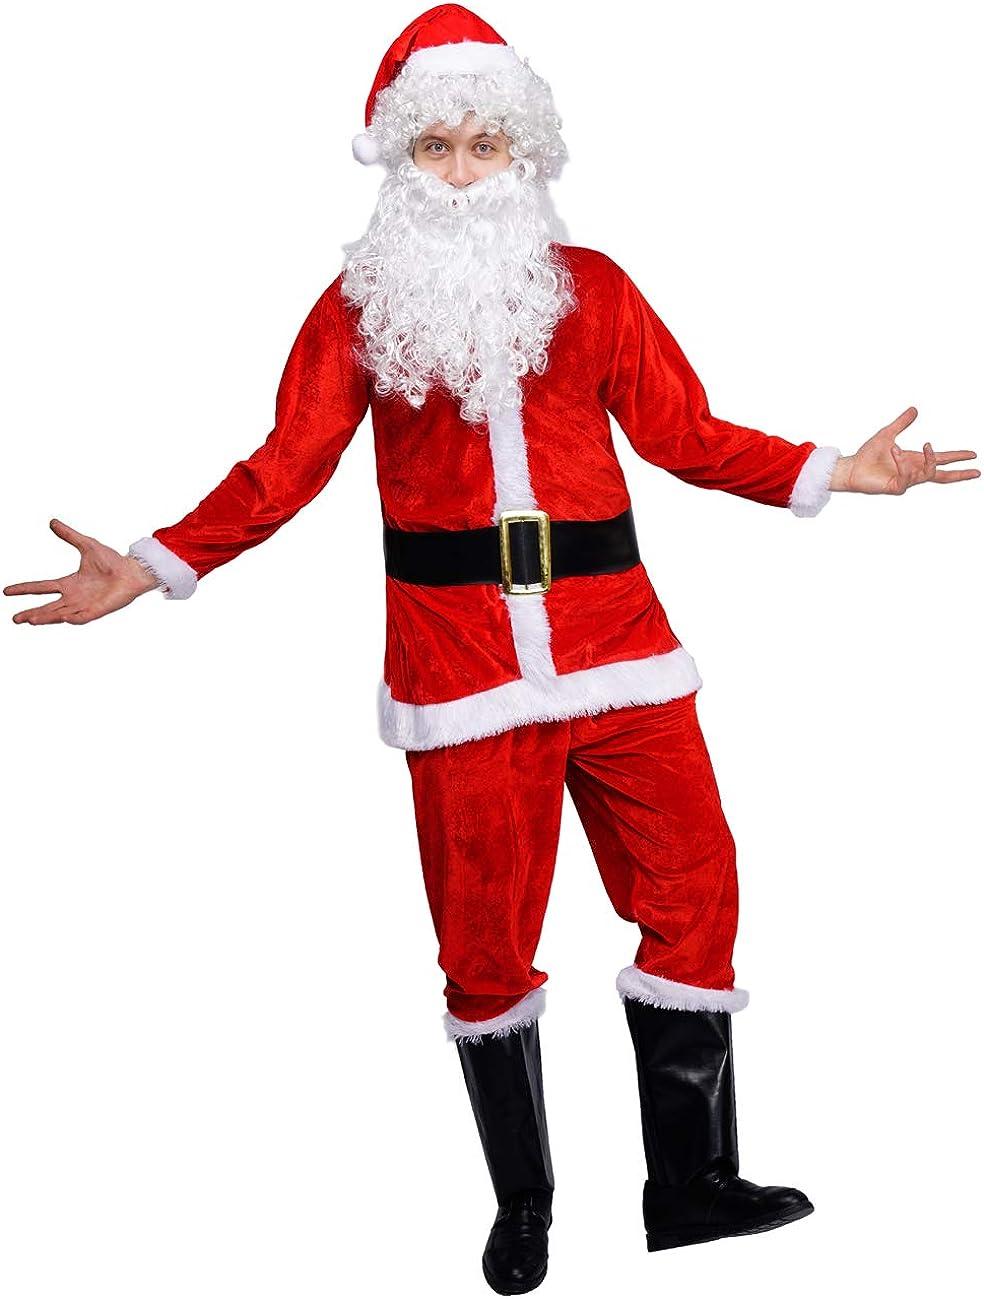 Adult 7 Piece Deluxe Santa Claus Suit Father Christmas Xmas Fancy Dress Costume